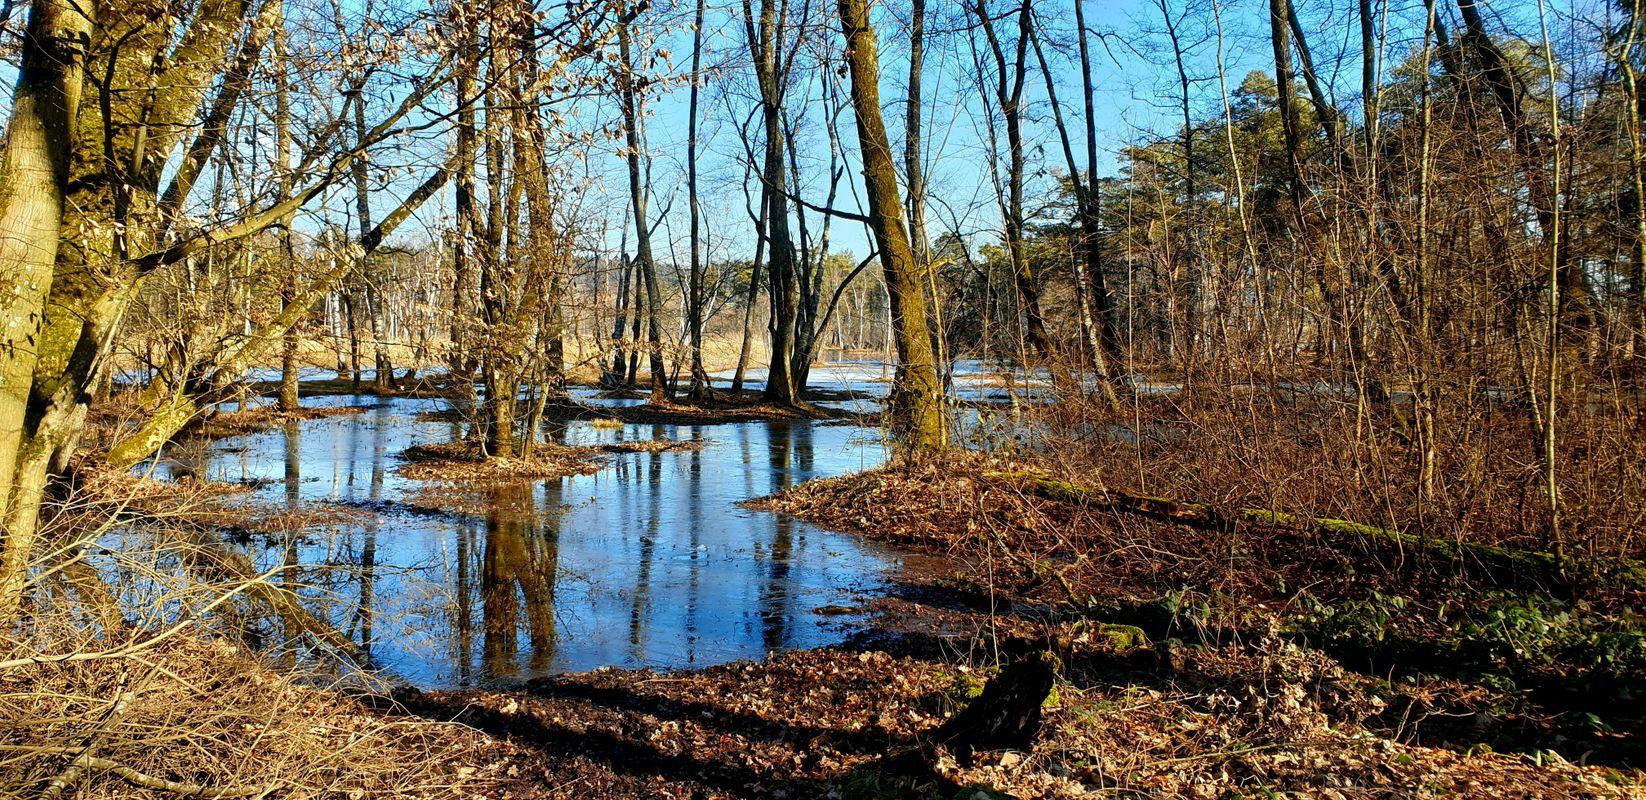 Frozen Lake reflecting the blue sky